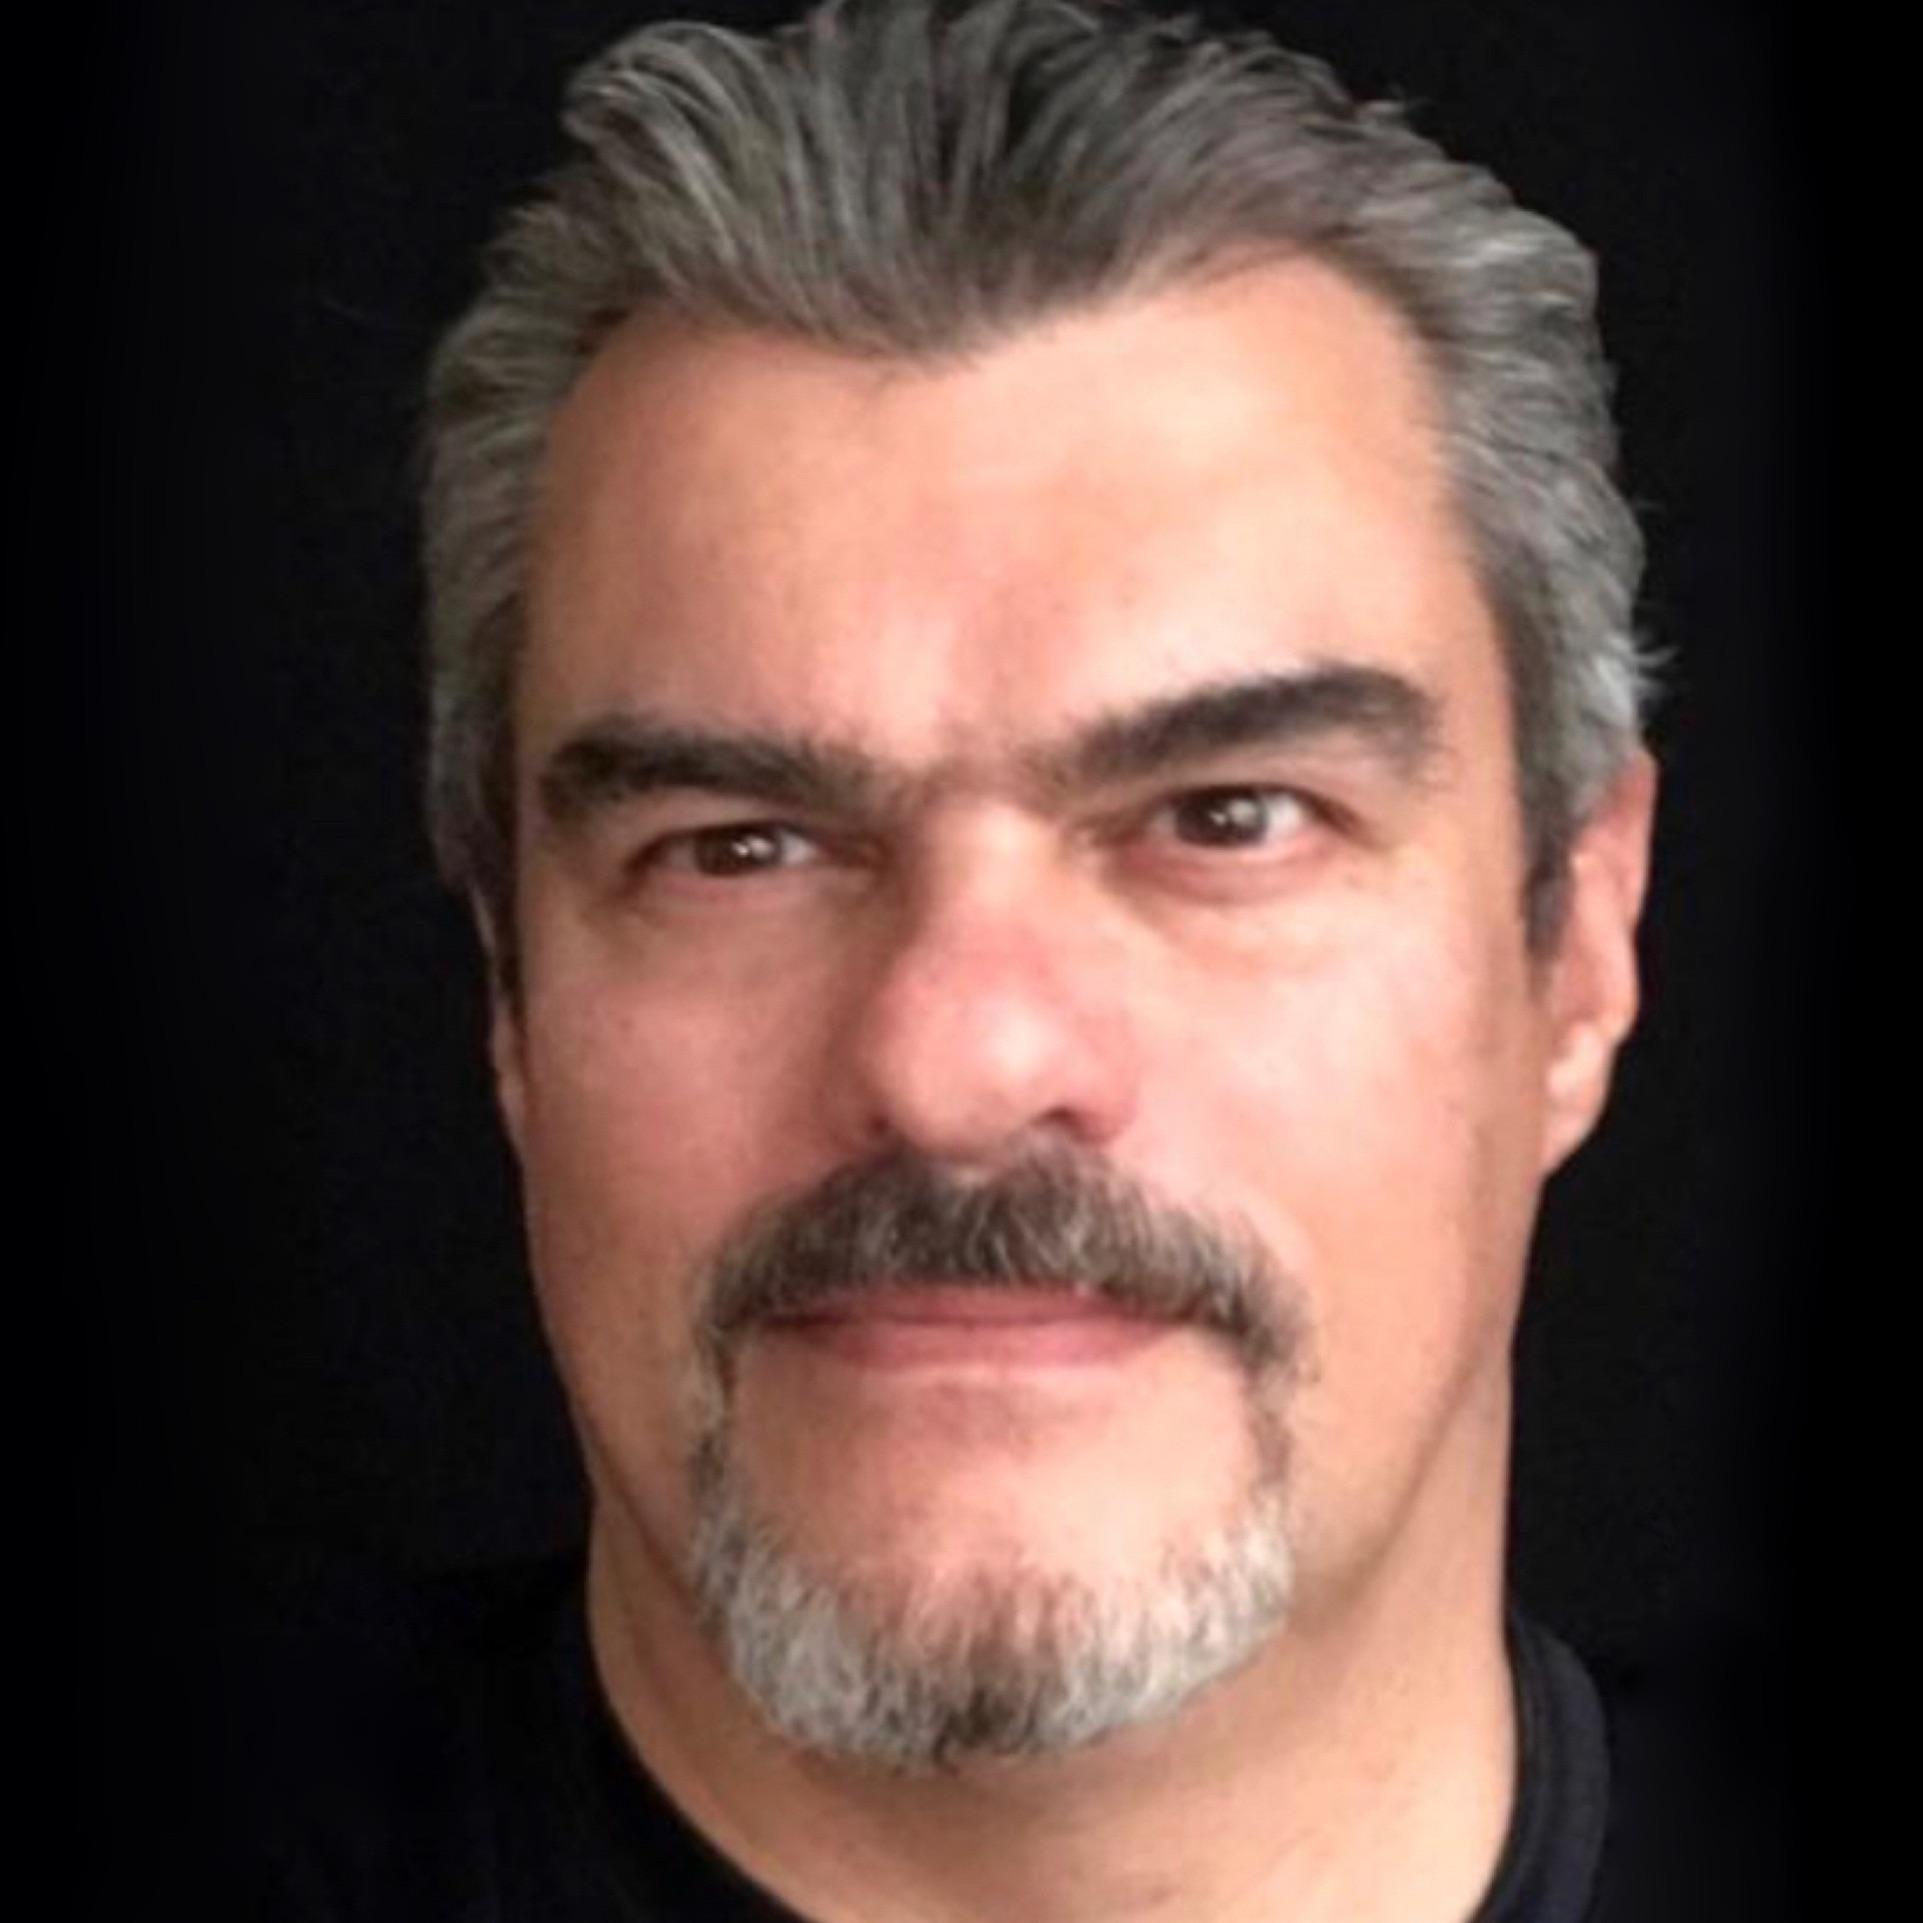 Santiago Beorlegui